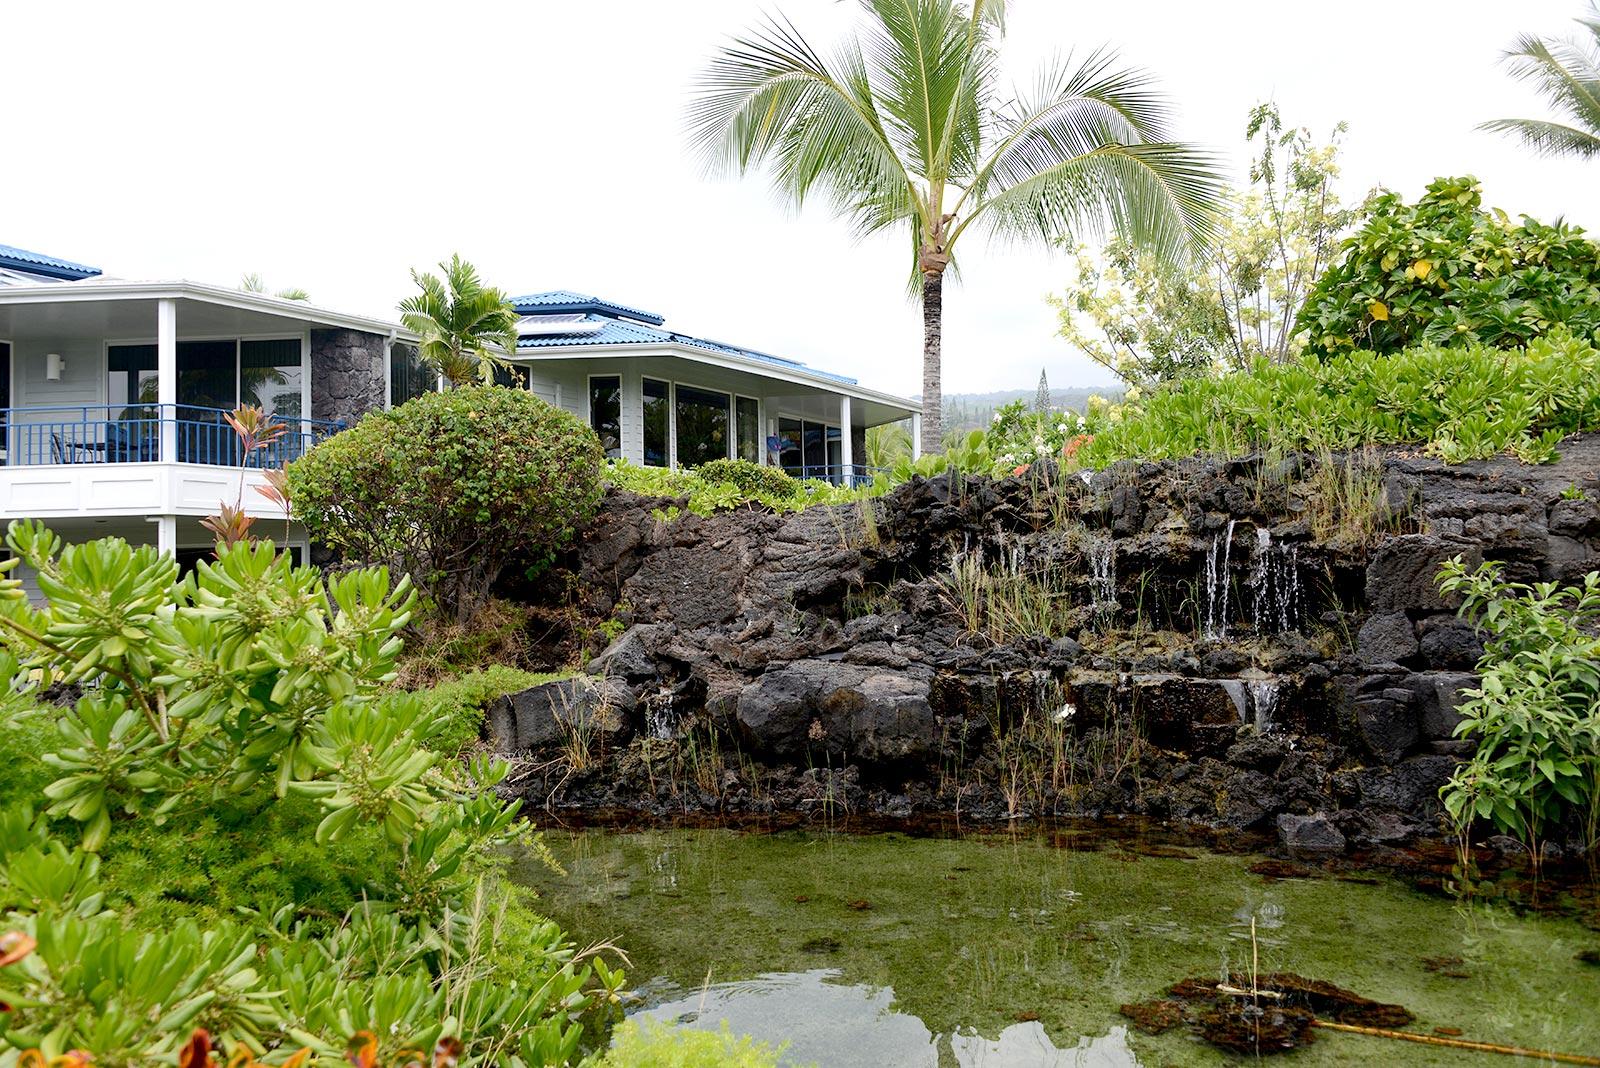 Apartment Mauna Loa 1 Bedroom 1 Bathroom photo 20213529